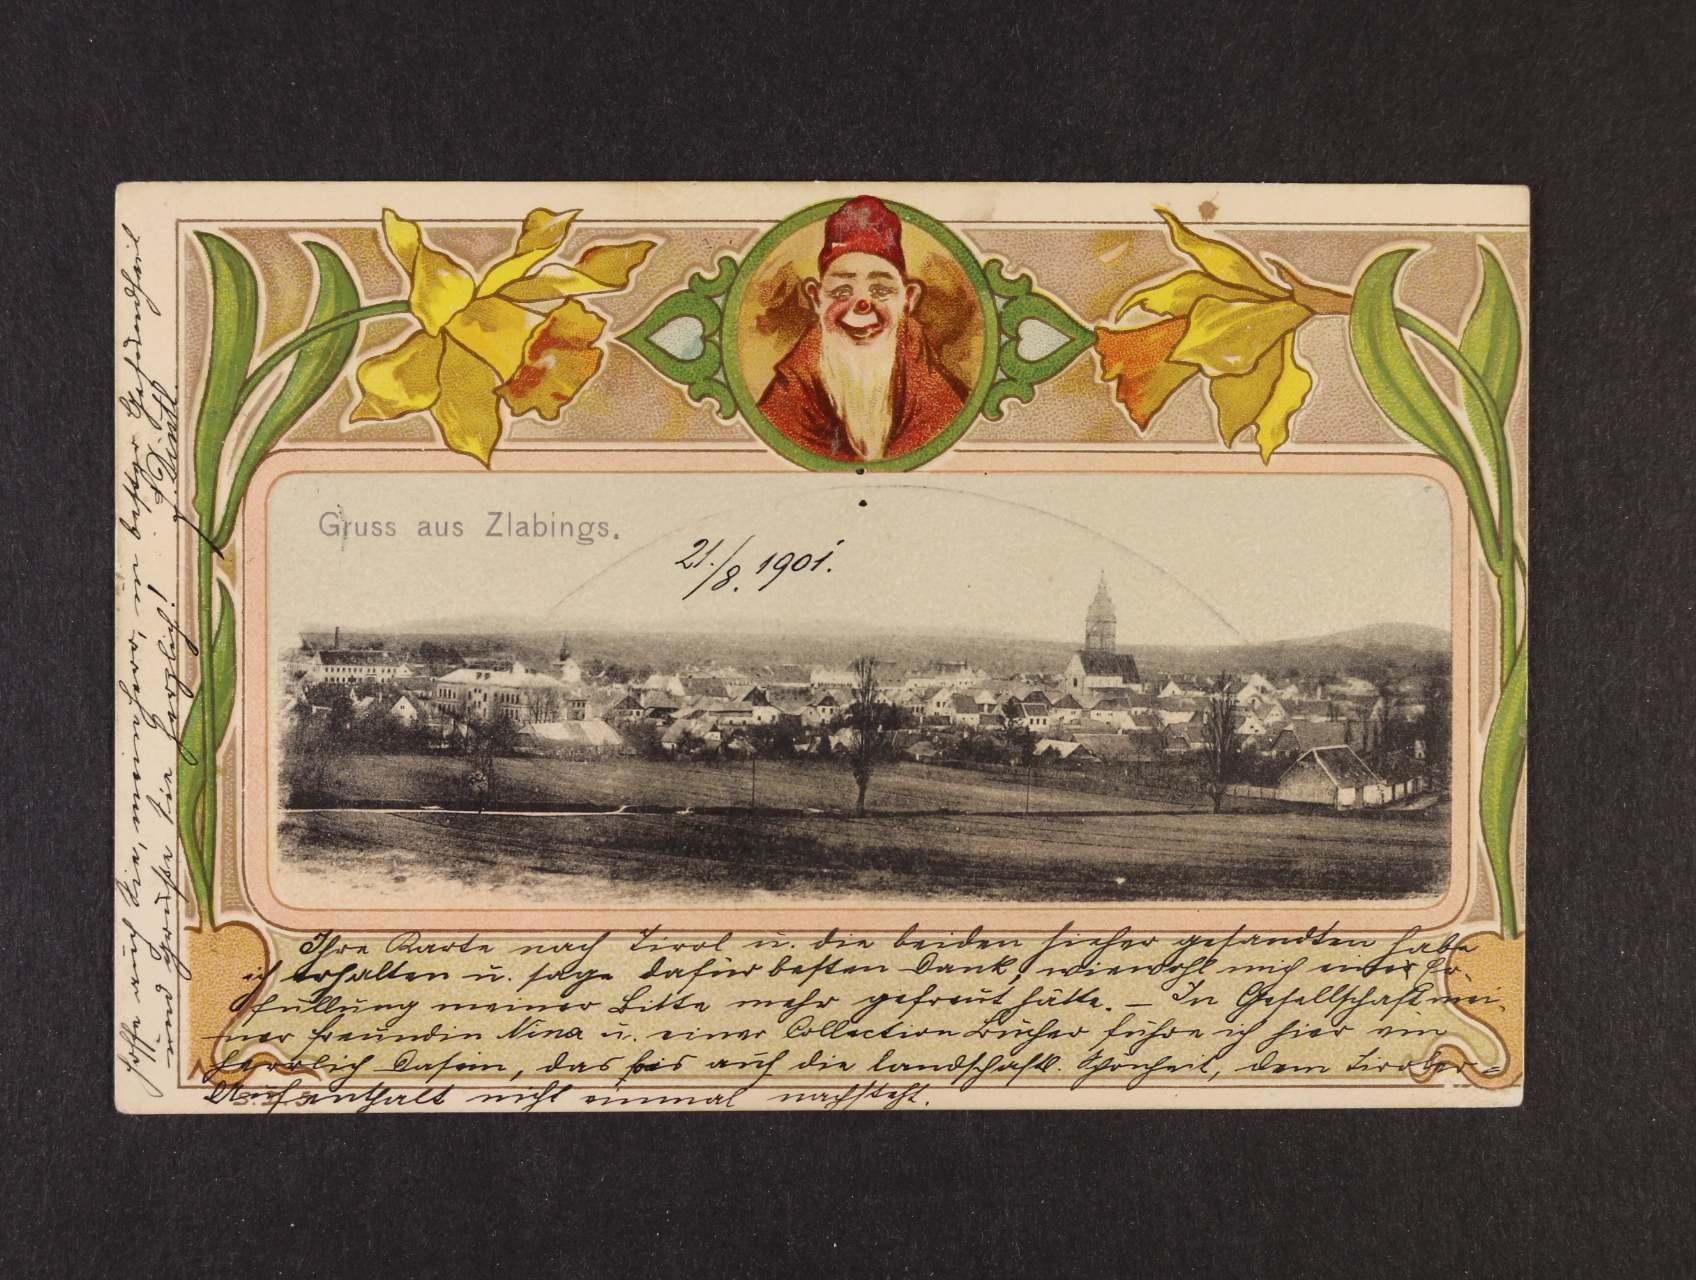 Slavonice - okénková koláž použitá 1901, dobrá kvalita